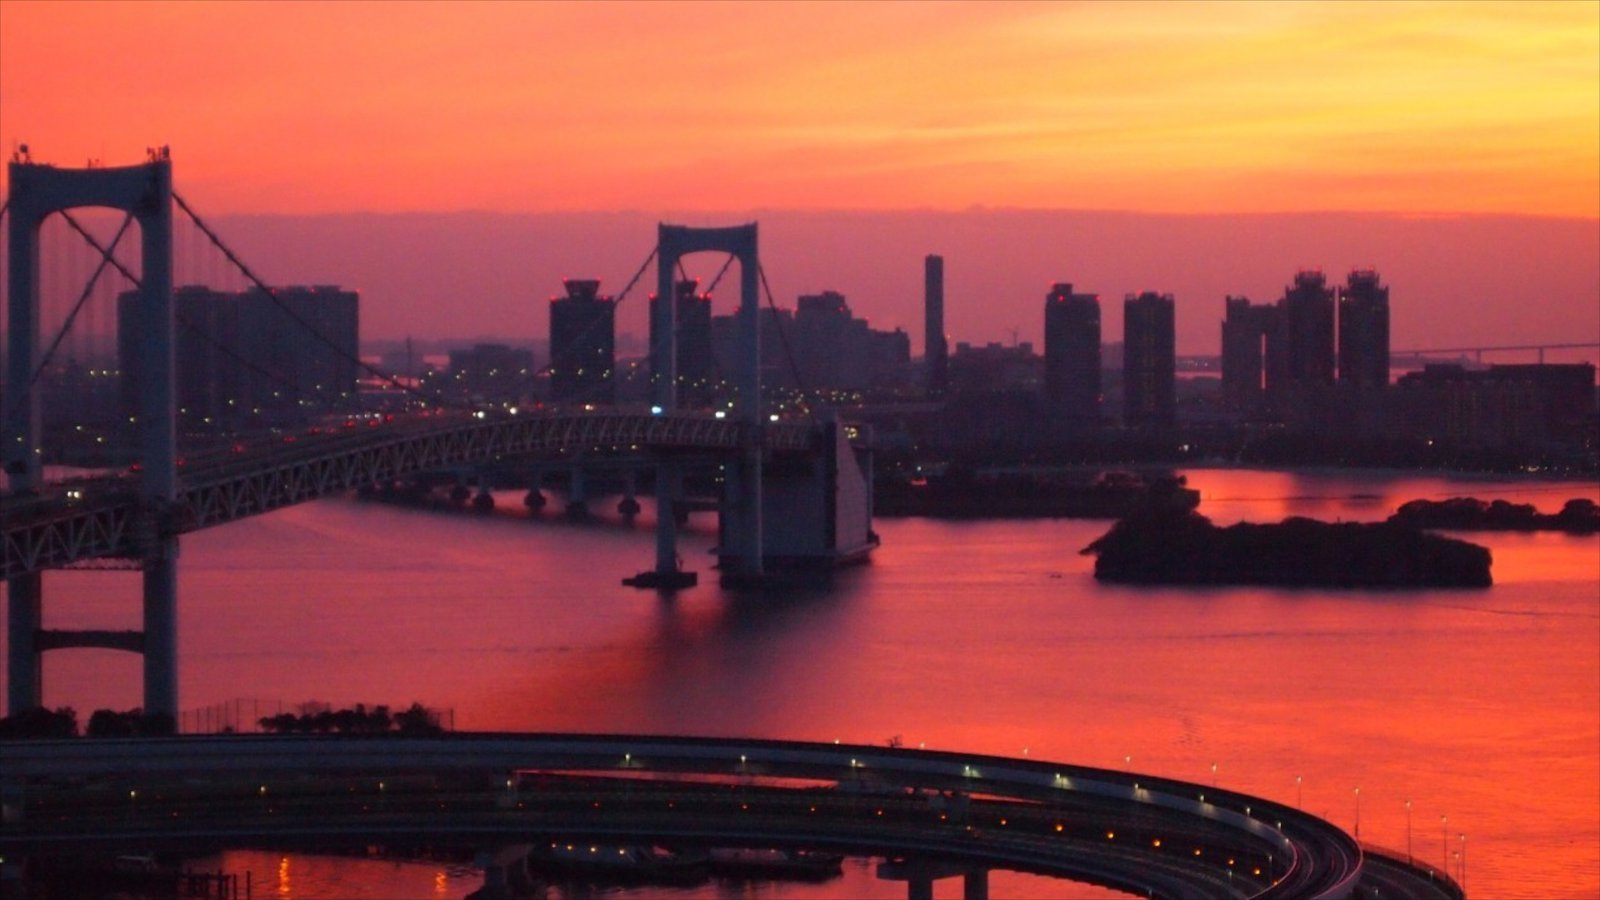 Rainbow Bridge featuring a city, a sunset and a bridge